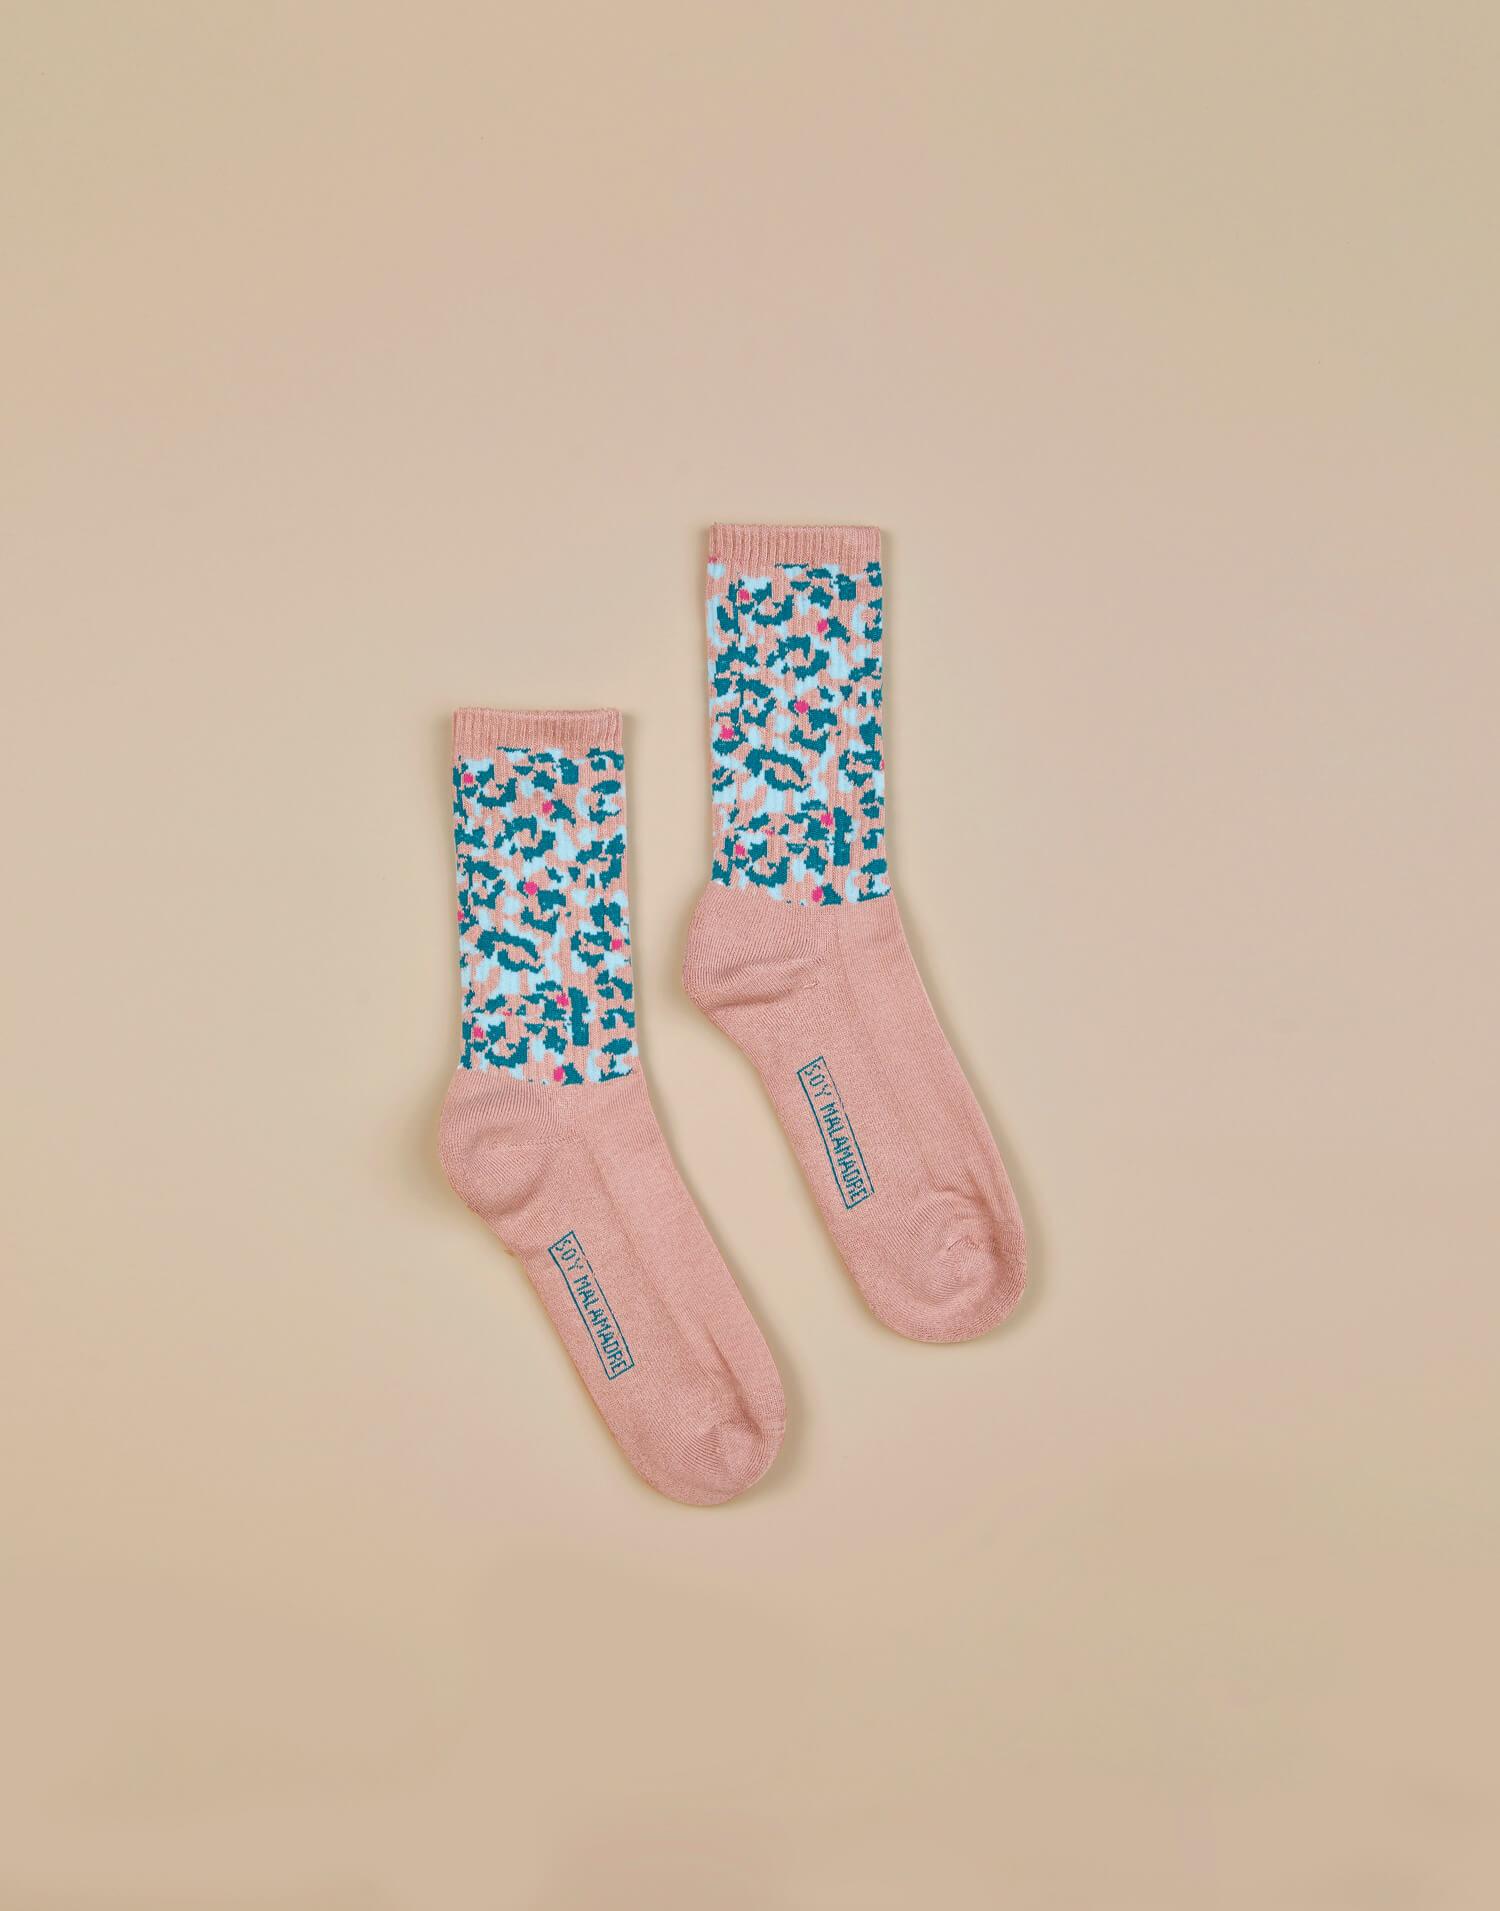 calcetines-power-malamadre-coleccion